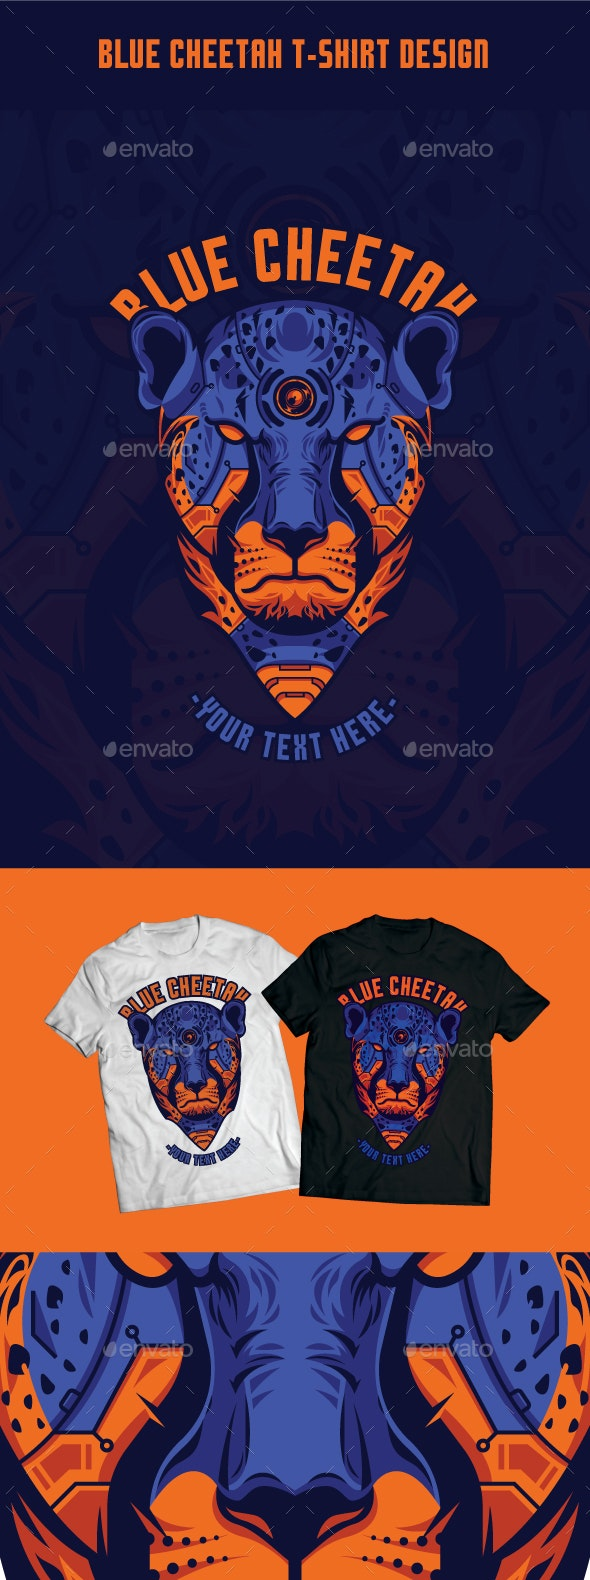 Blue Cheetah T-Shirt Design - T-Shirts